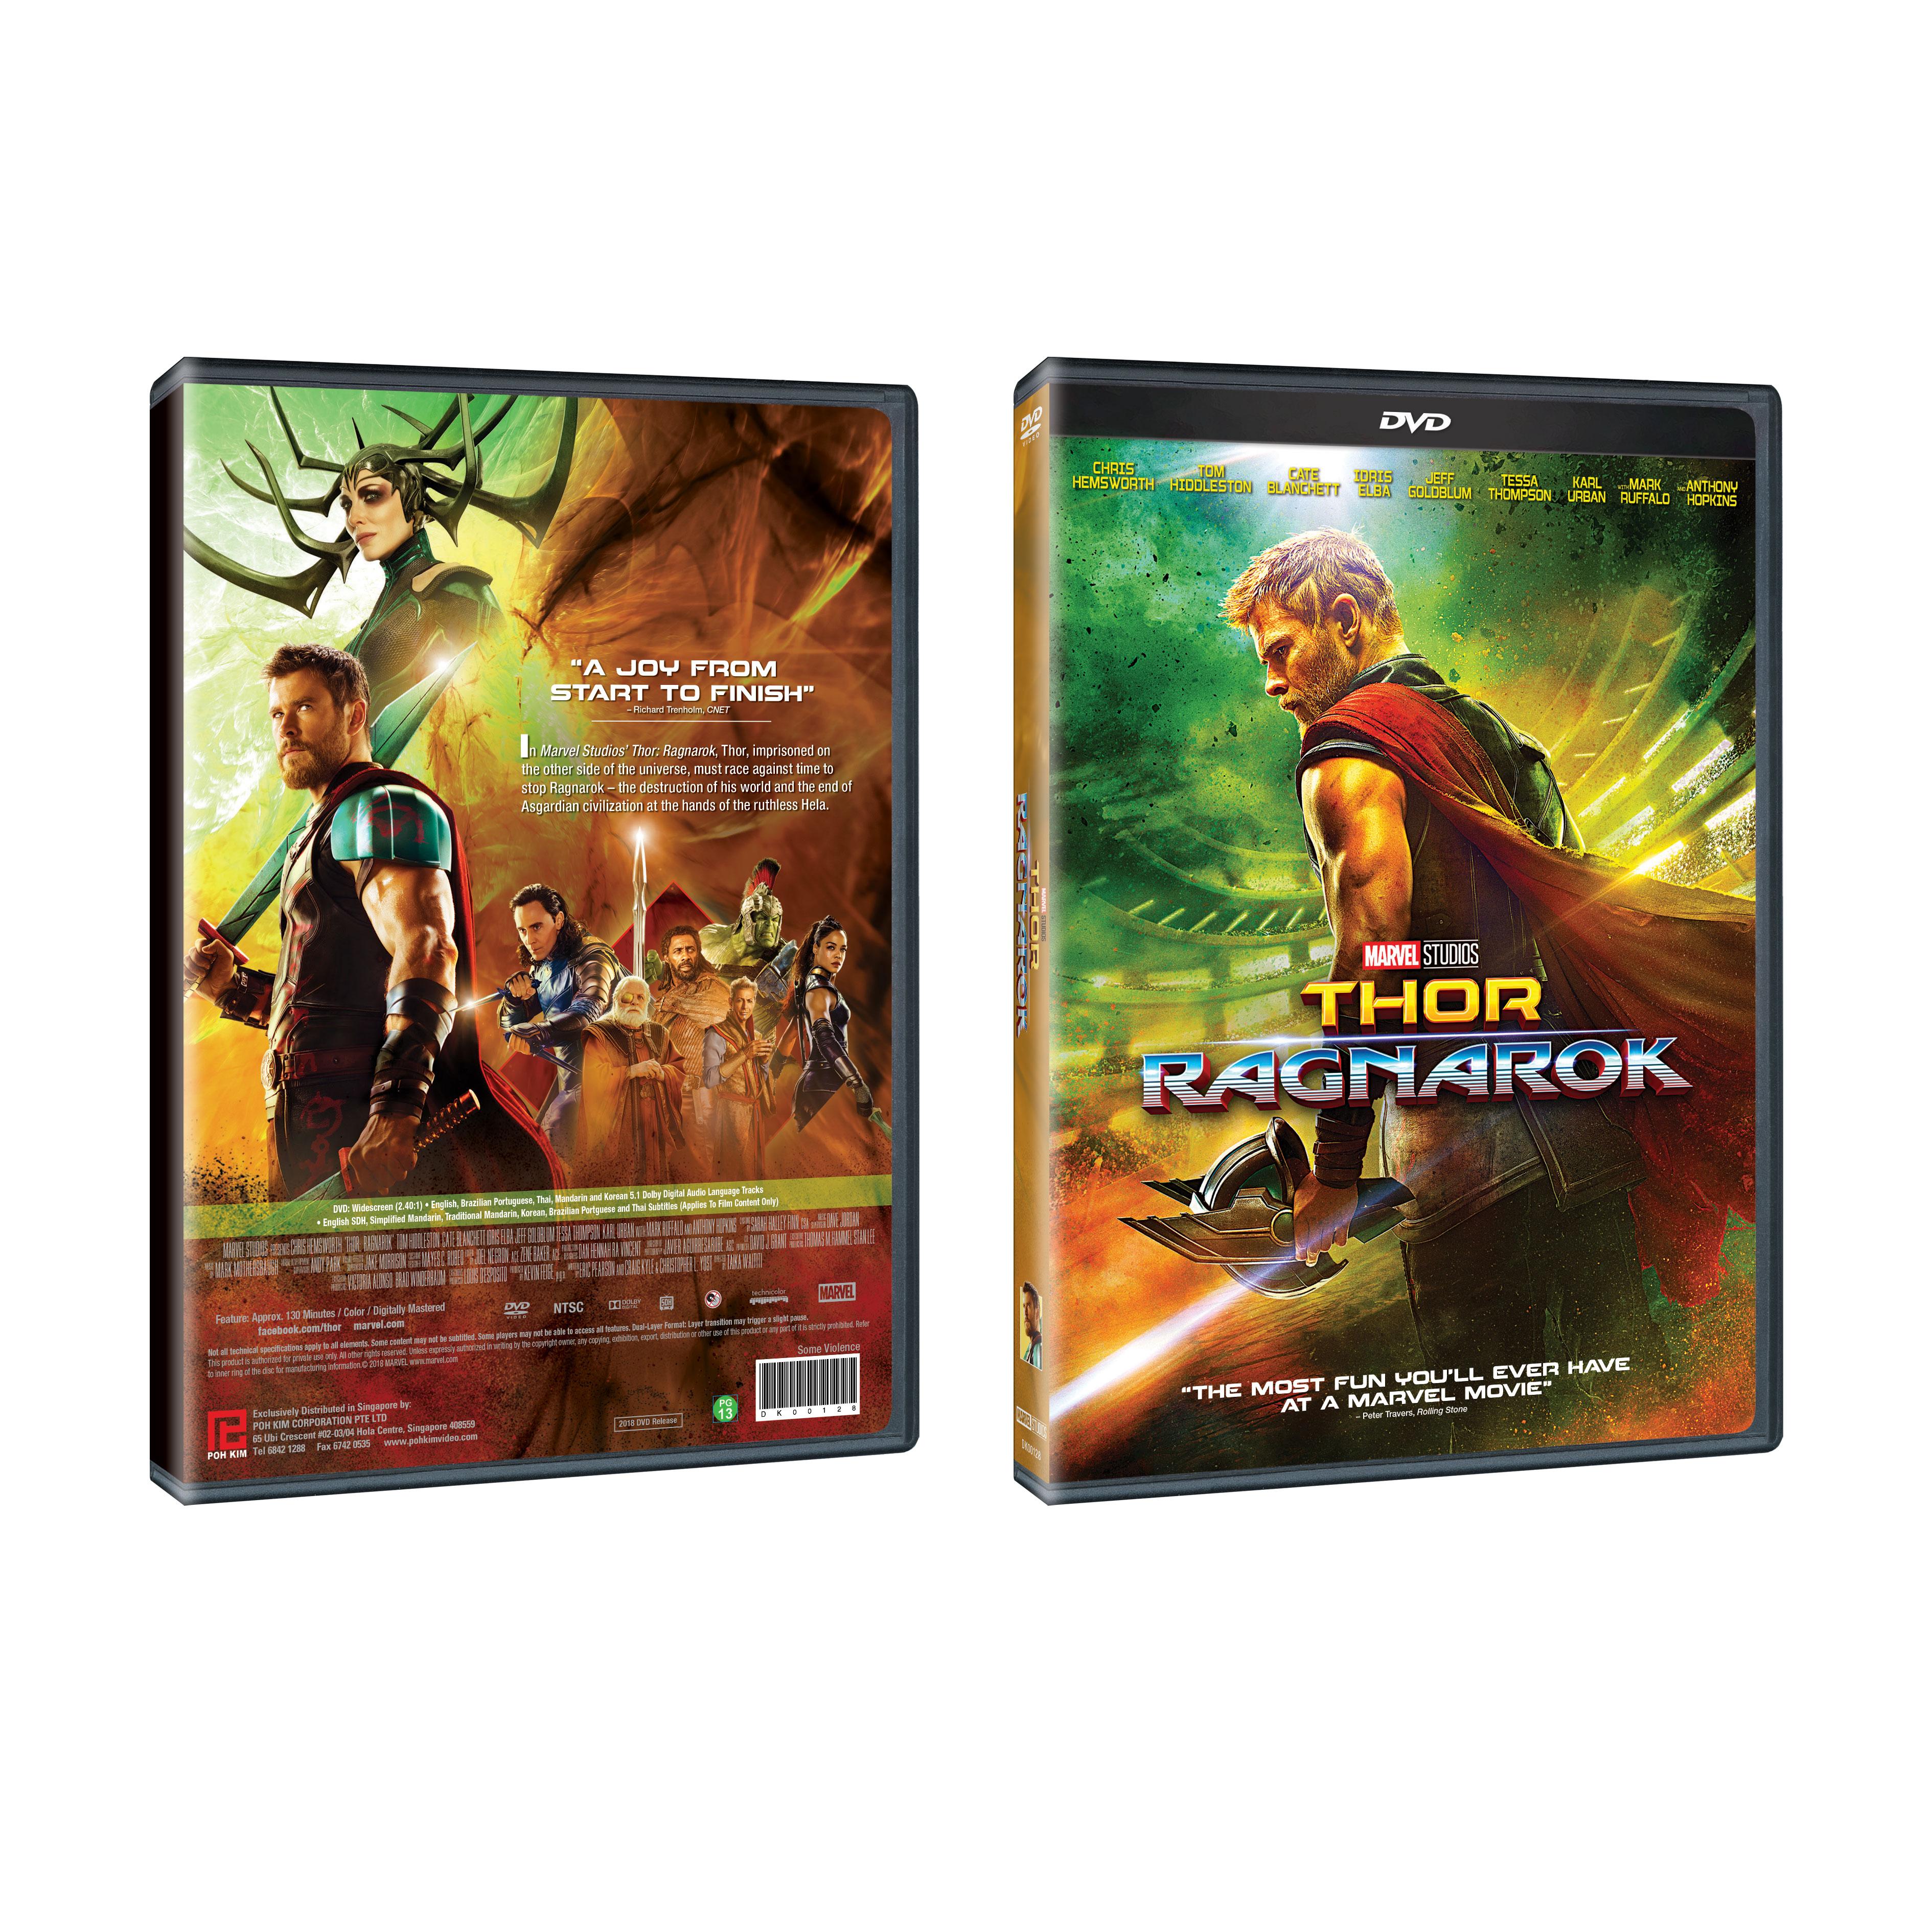 Thor Ragnarok Dvd Poh Kim Video